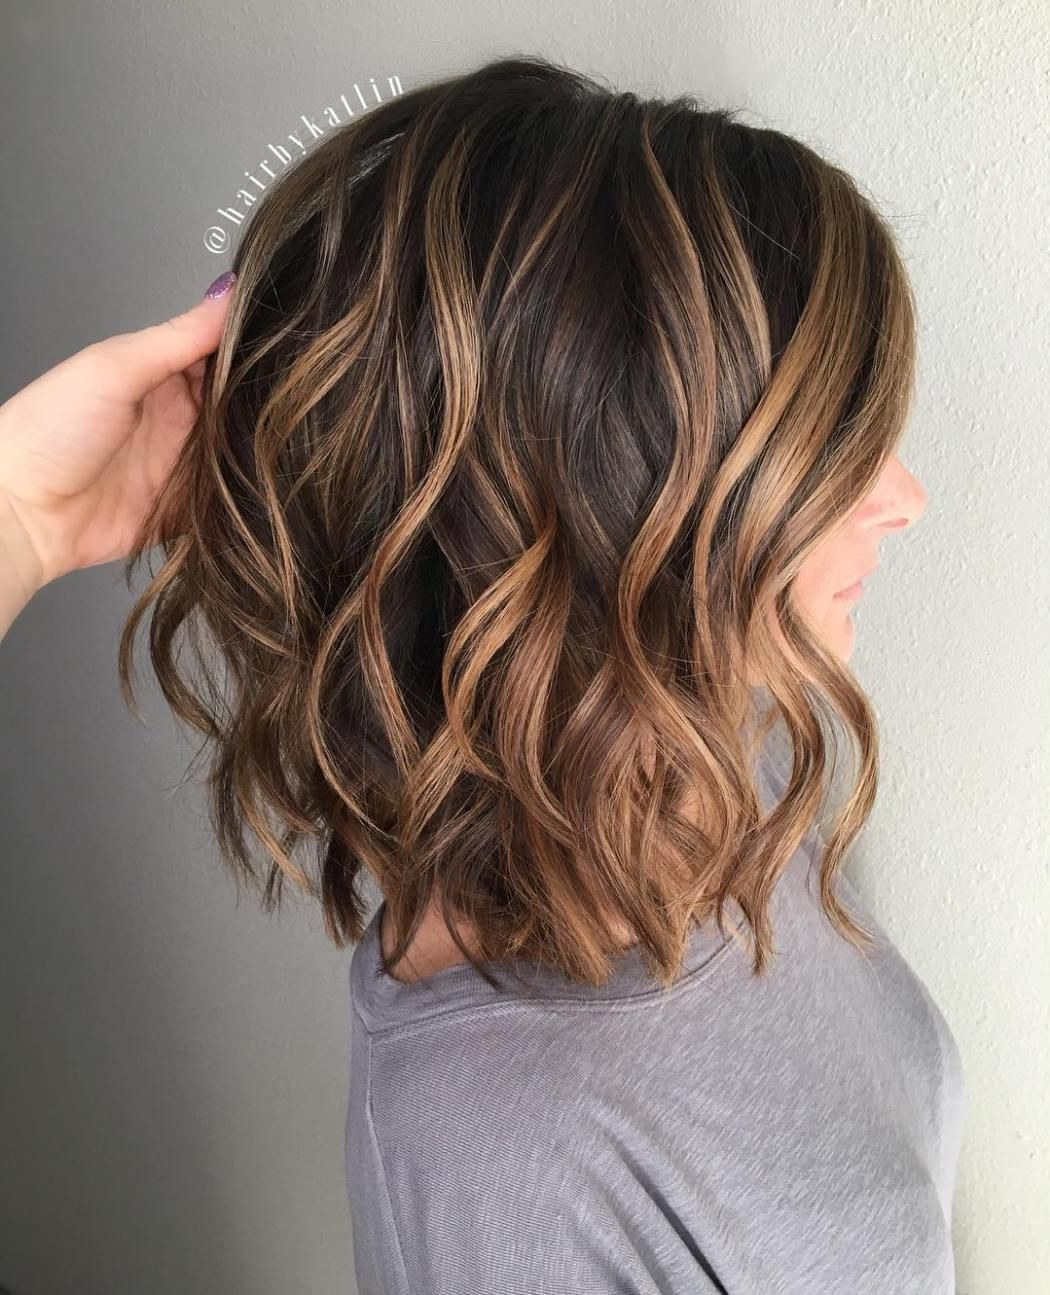 Mid Length Dark Brown Hair With Caramel Highlights Makeupsite